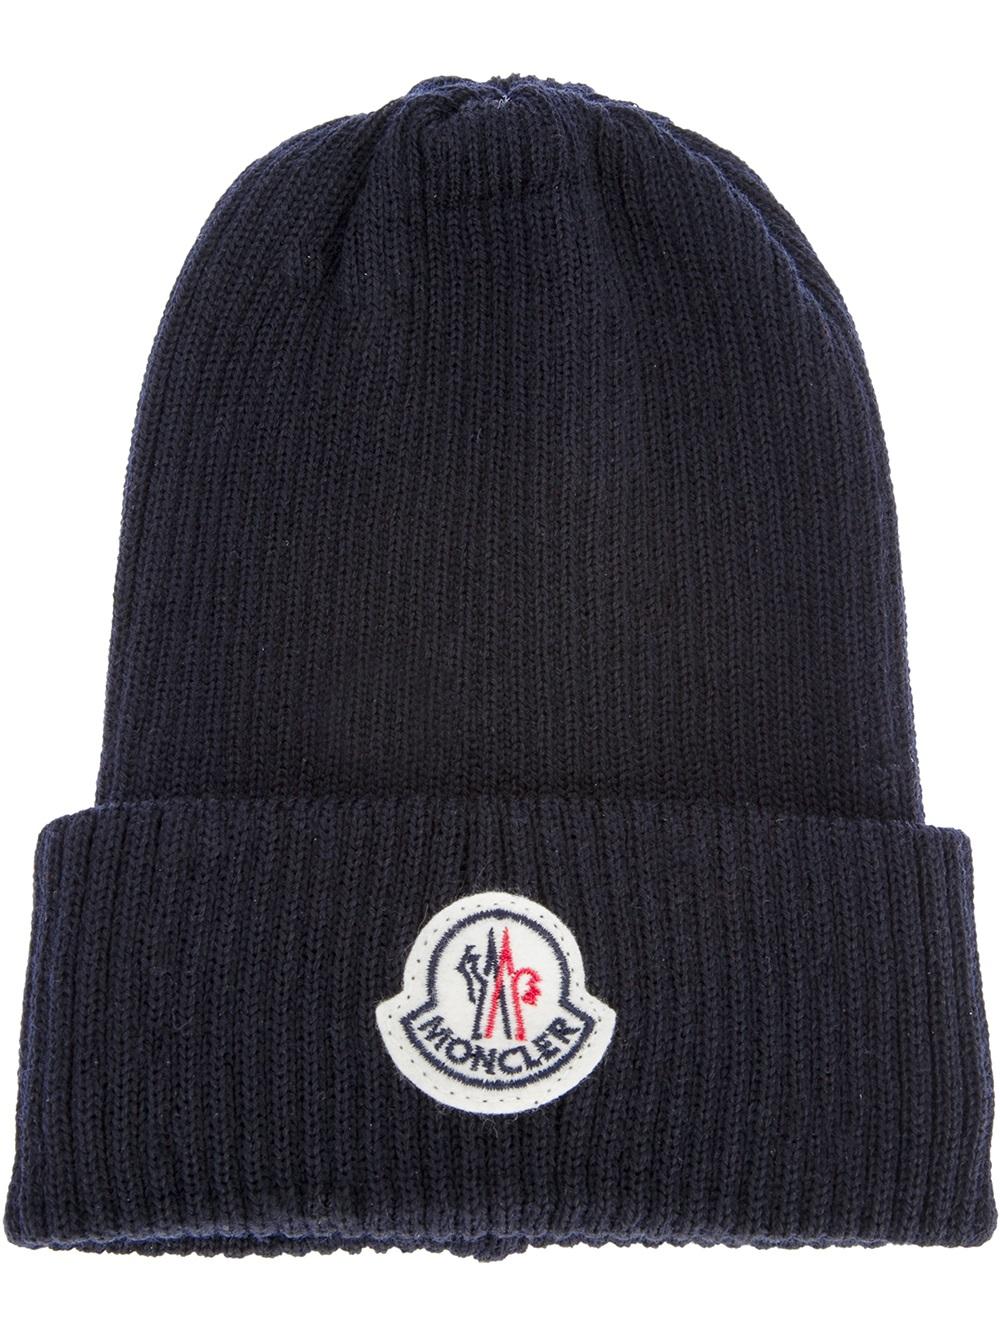 Moncler Branded Beanie Hat In Blue For Men Navy Lyst